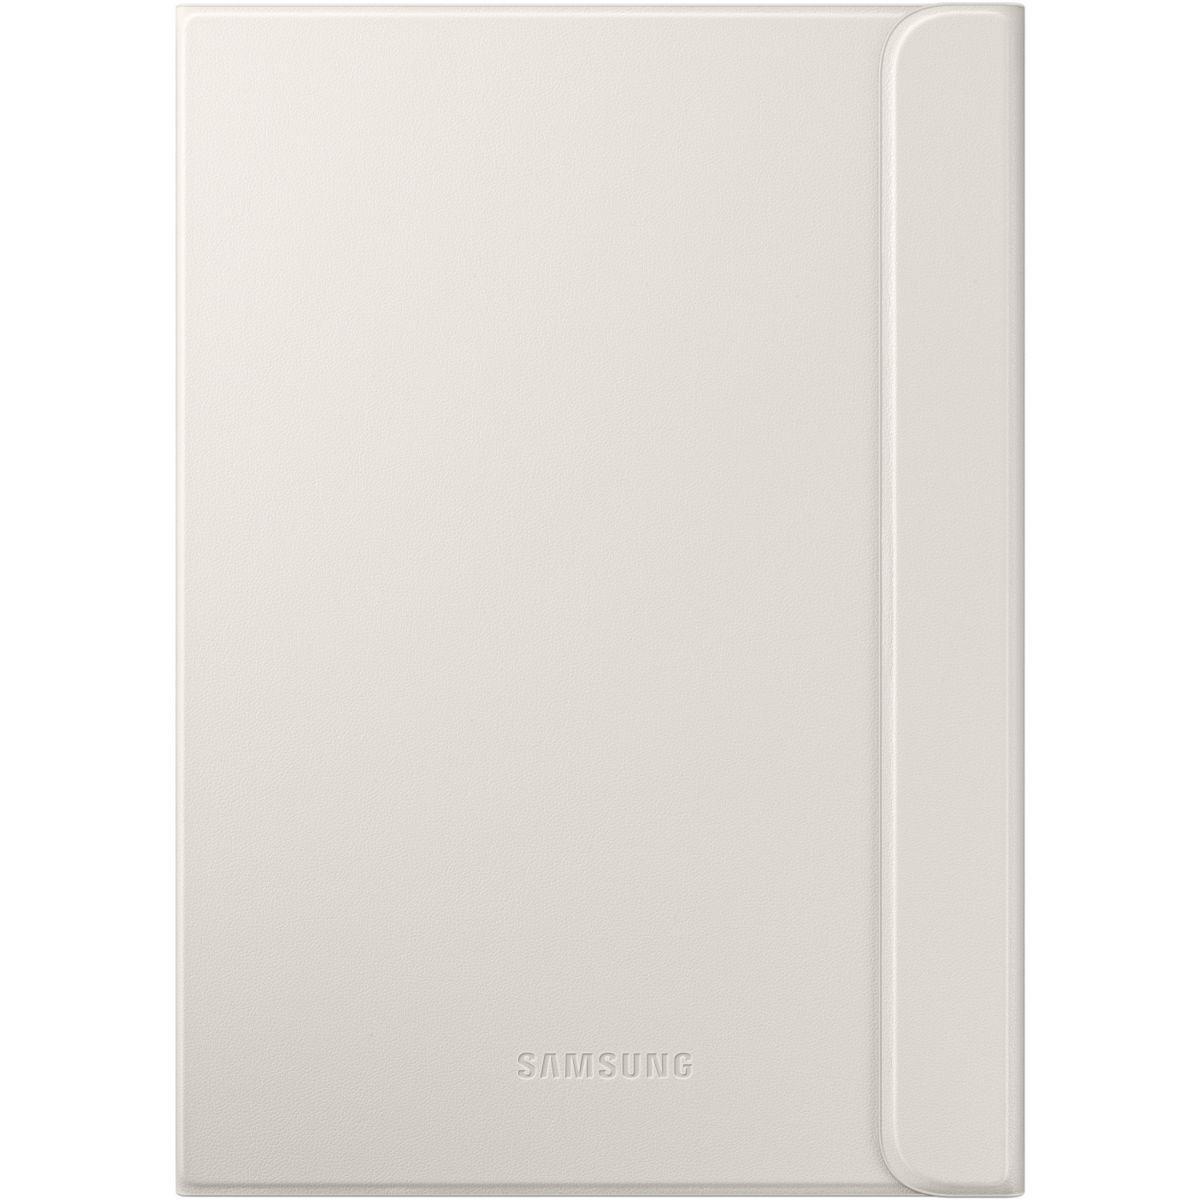 Etui tablette samsung book cover tab s2 9.7'' blanc - livraison offerte : code liv (photo)